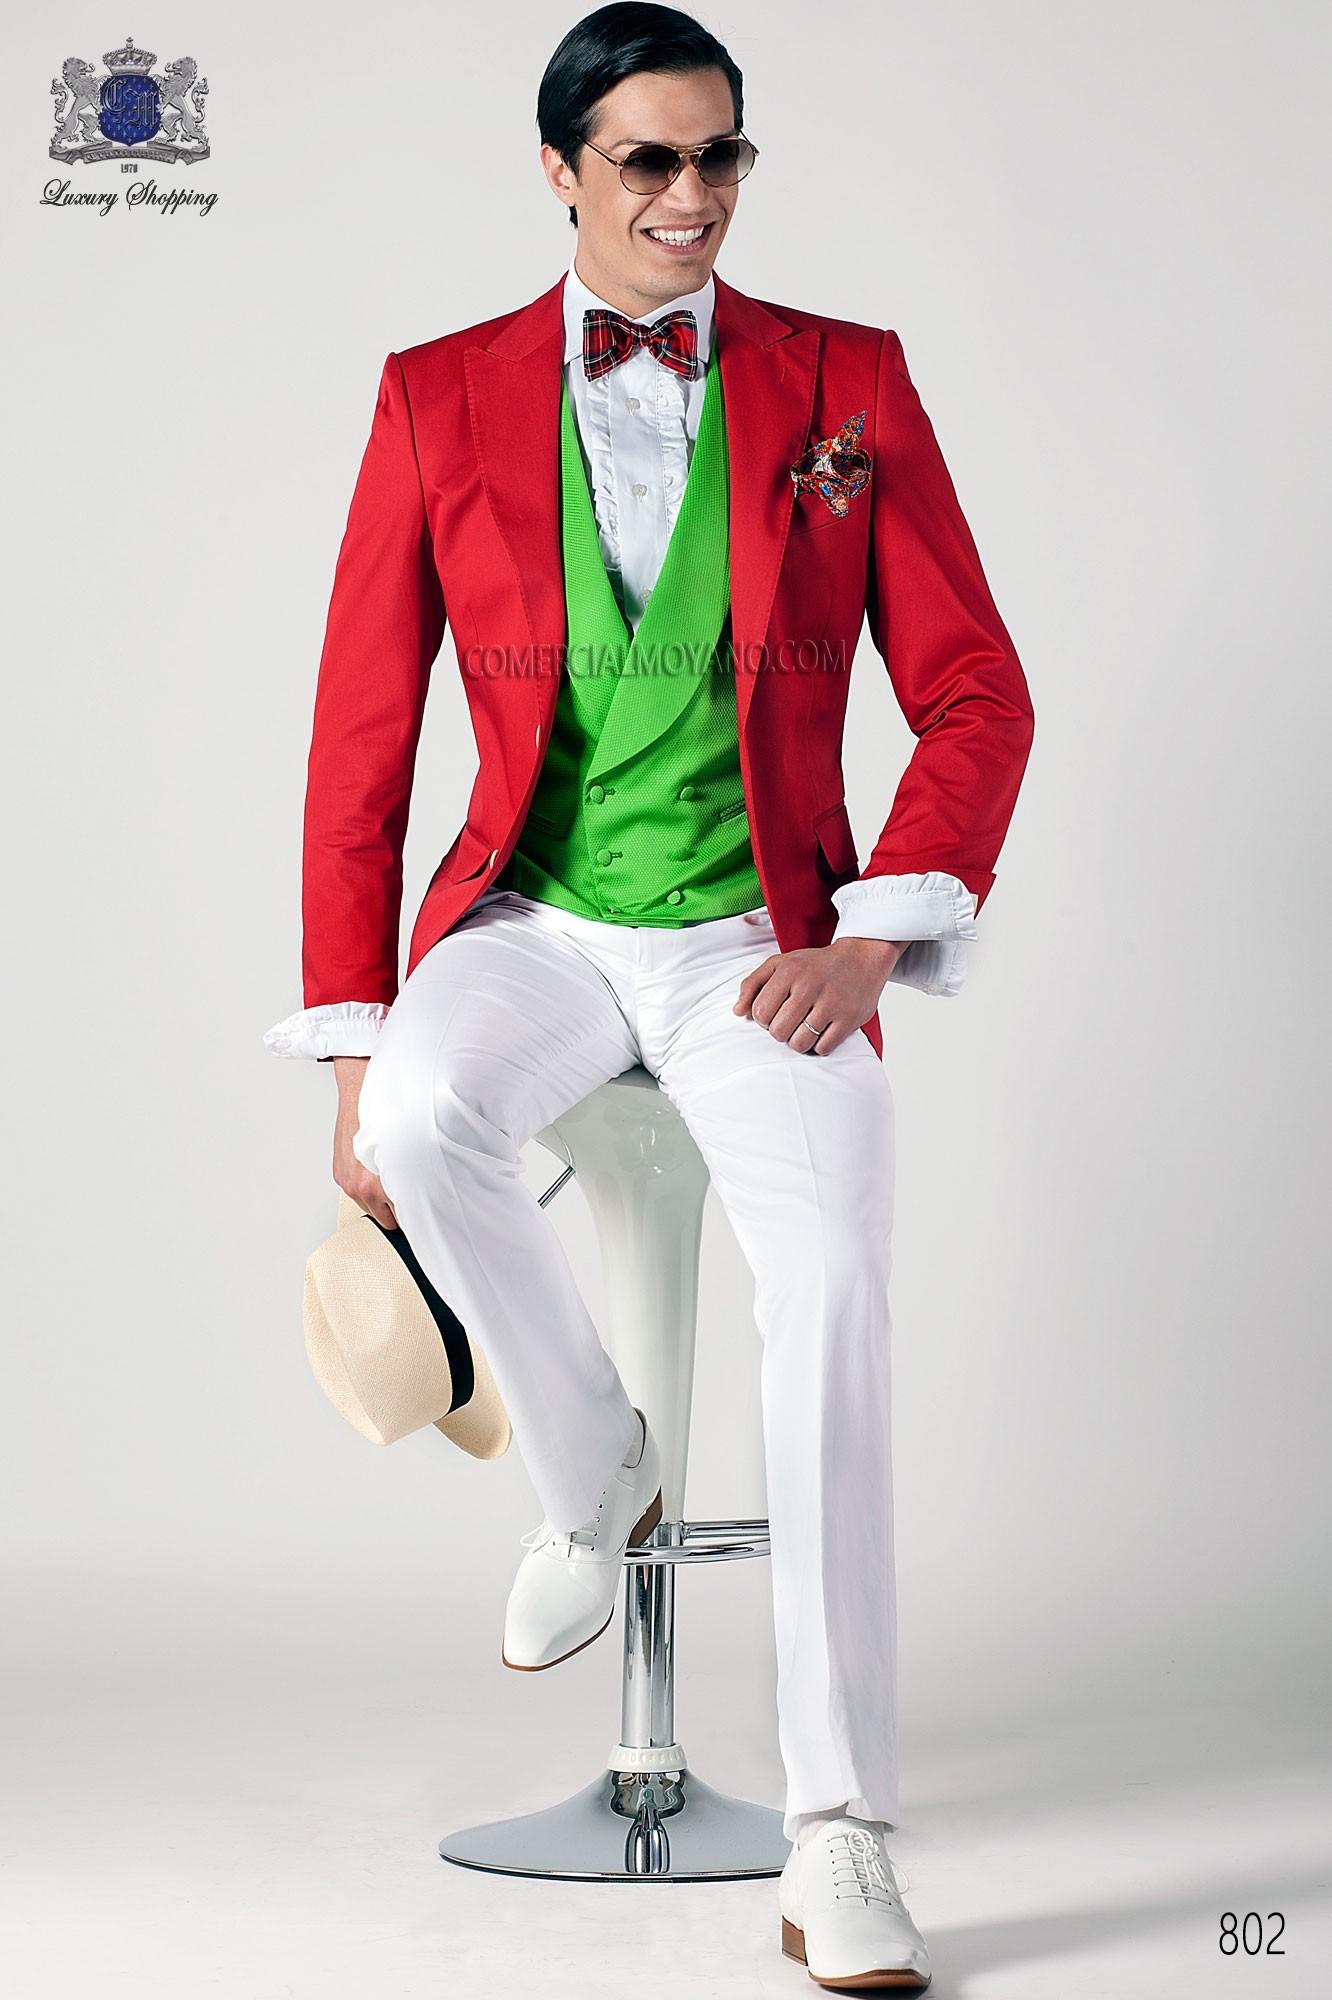 Traje de novio Hipster rojo modelo: 802 Ottavio Nuccio Gala colección Hipster